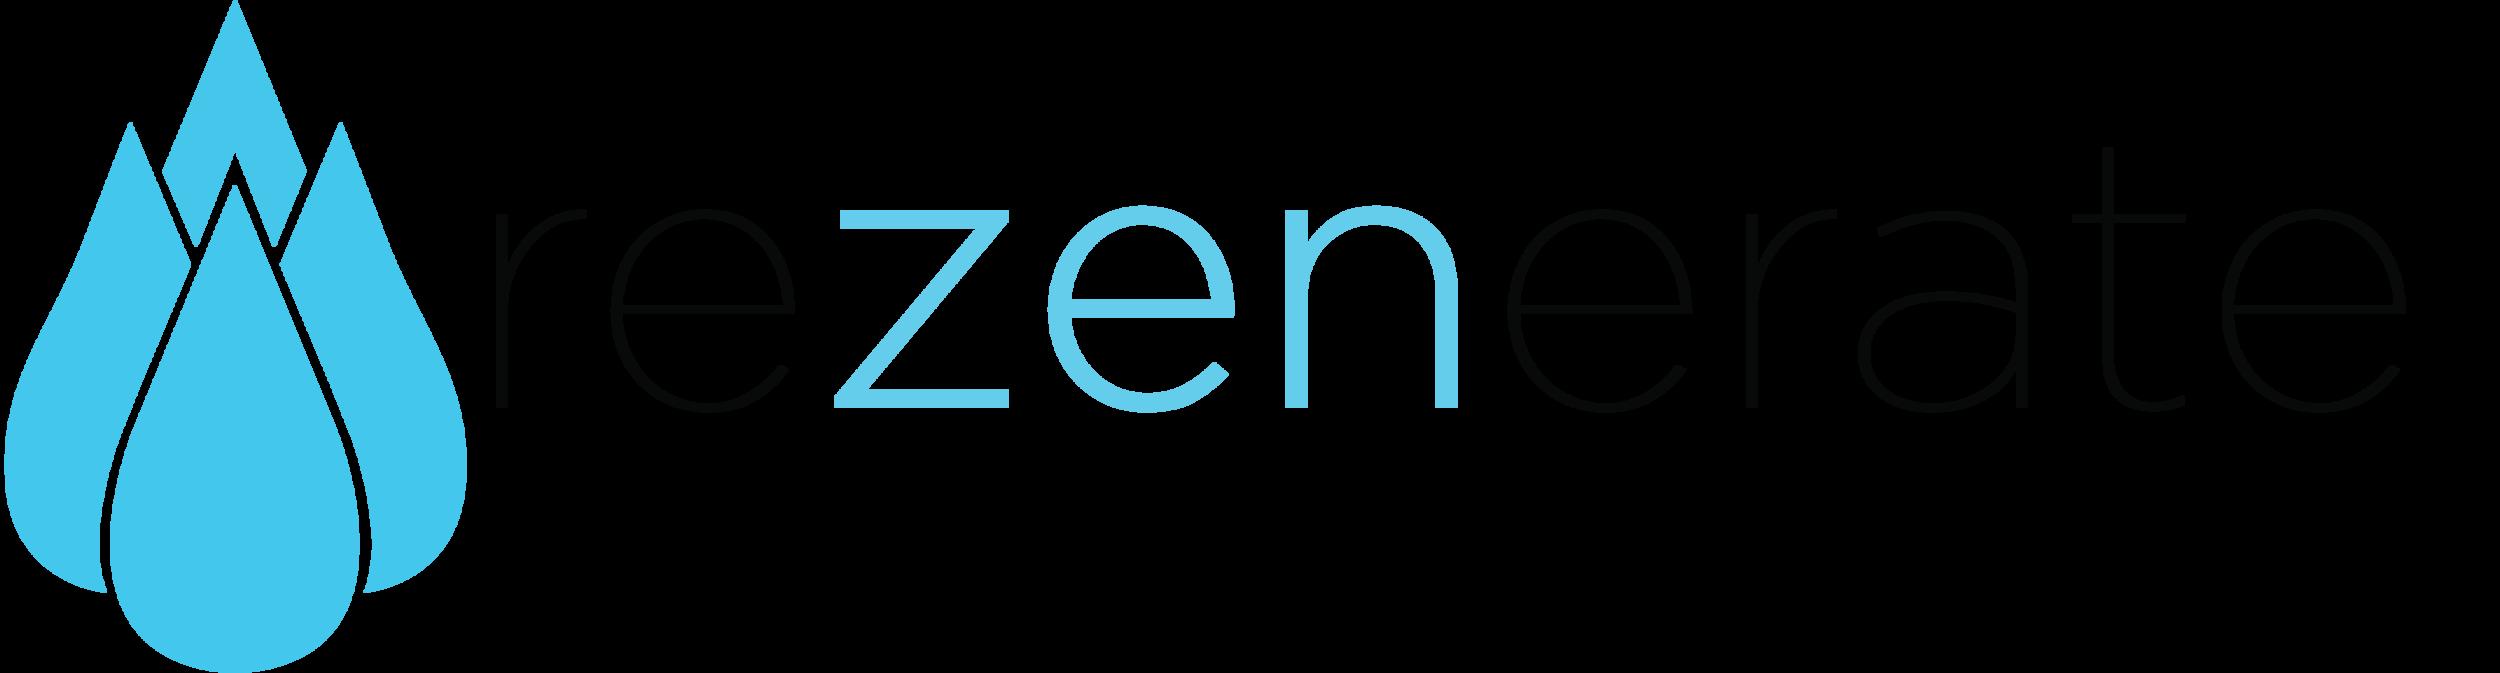 rezenerate-logo-4.png